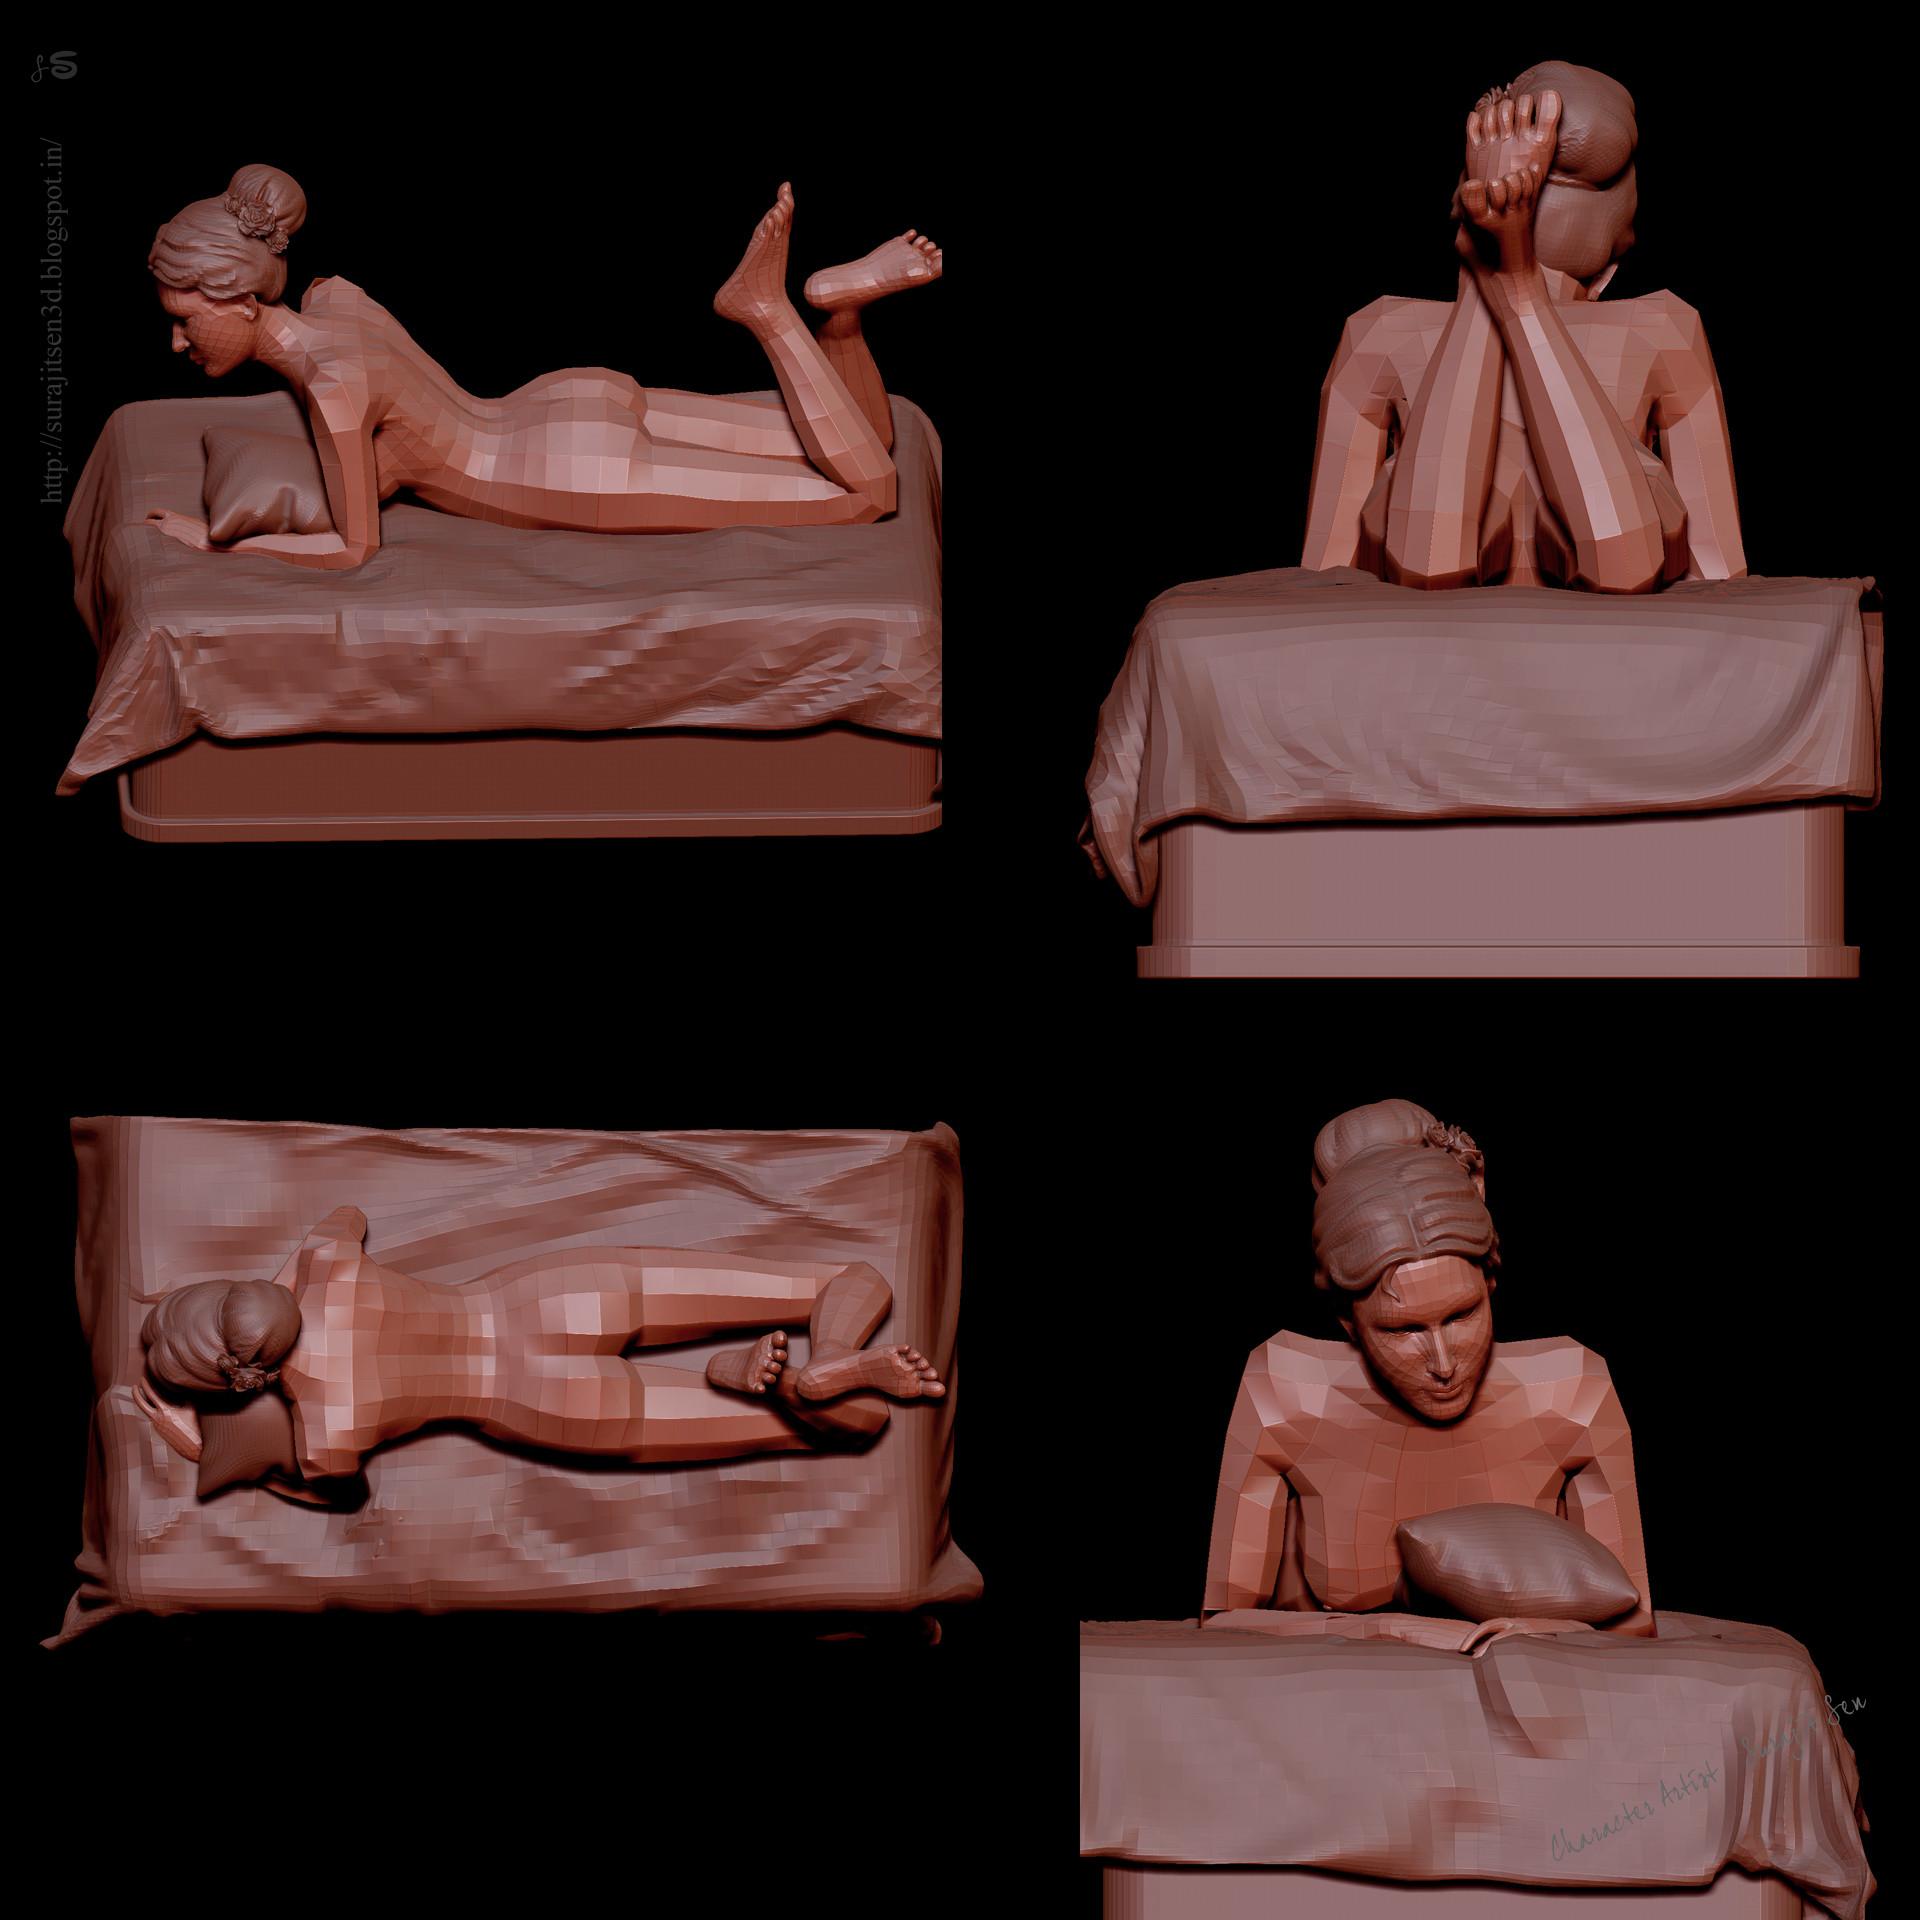 Surajit sen aphrodite wip sculpt by surajit sen 26012018